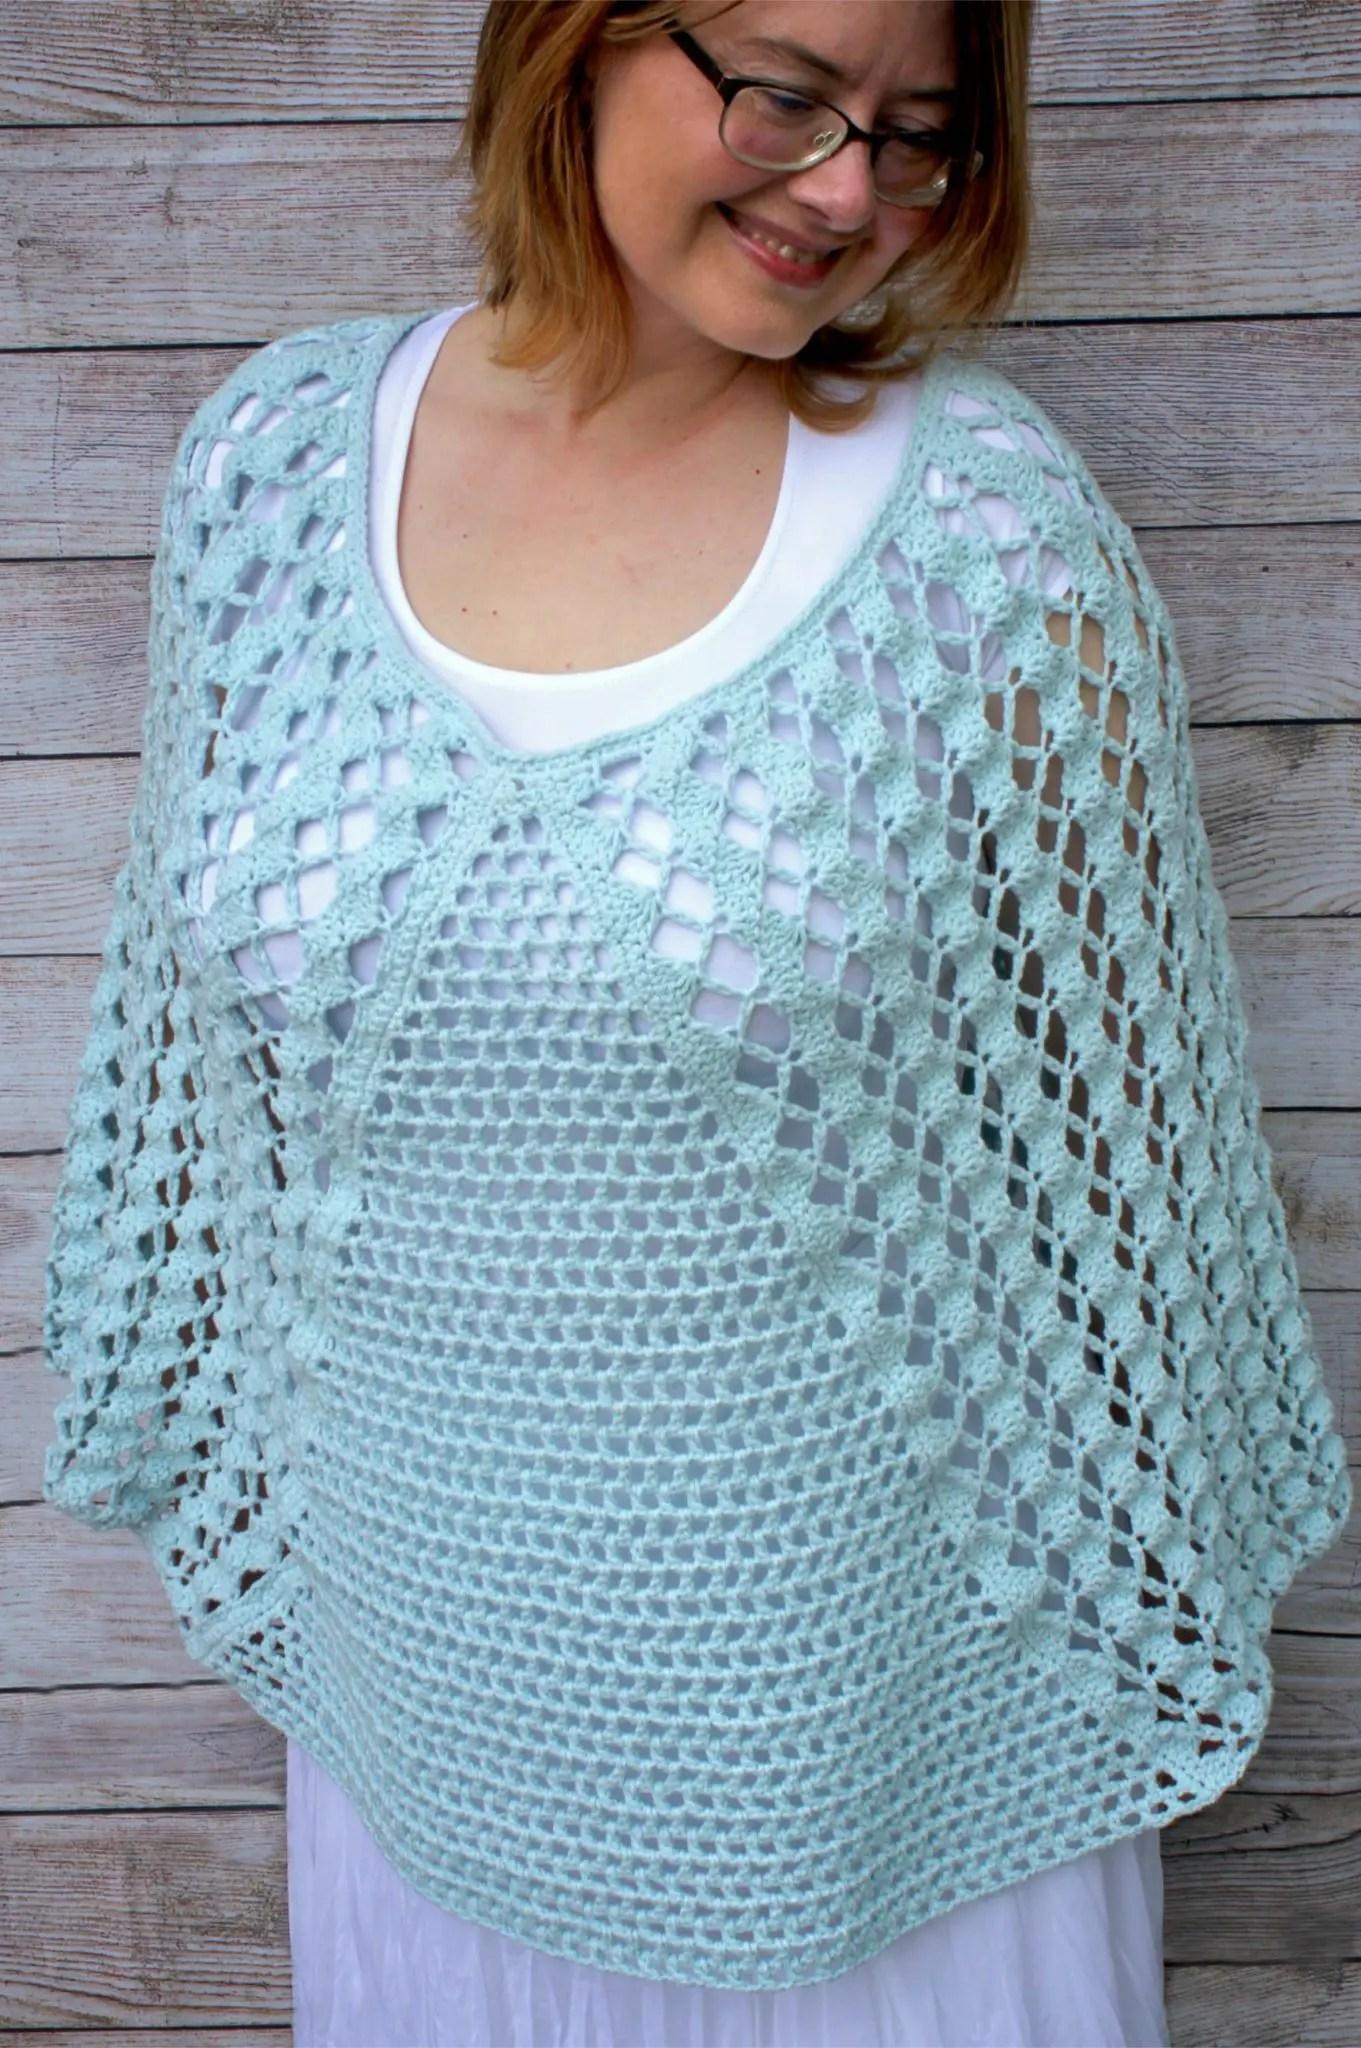 Whimsical Waves Poncho Free Crochet Pattern With Feels Like Butta Yarn